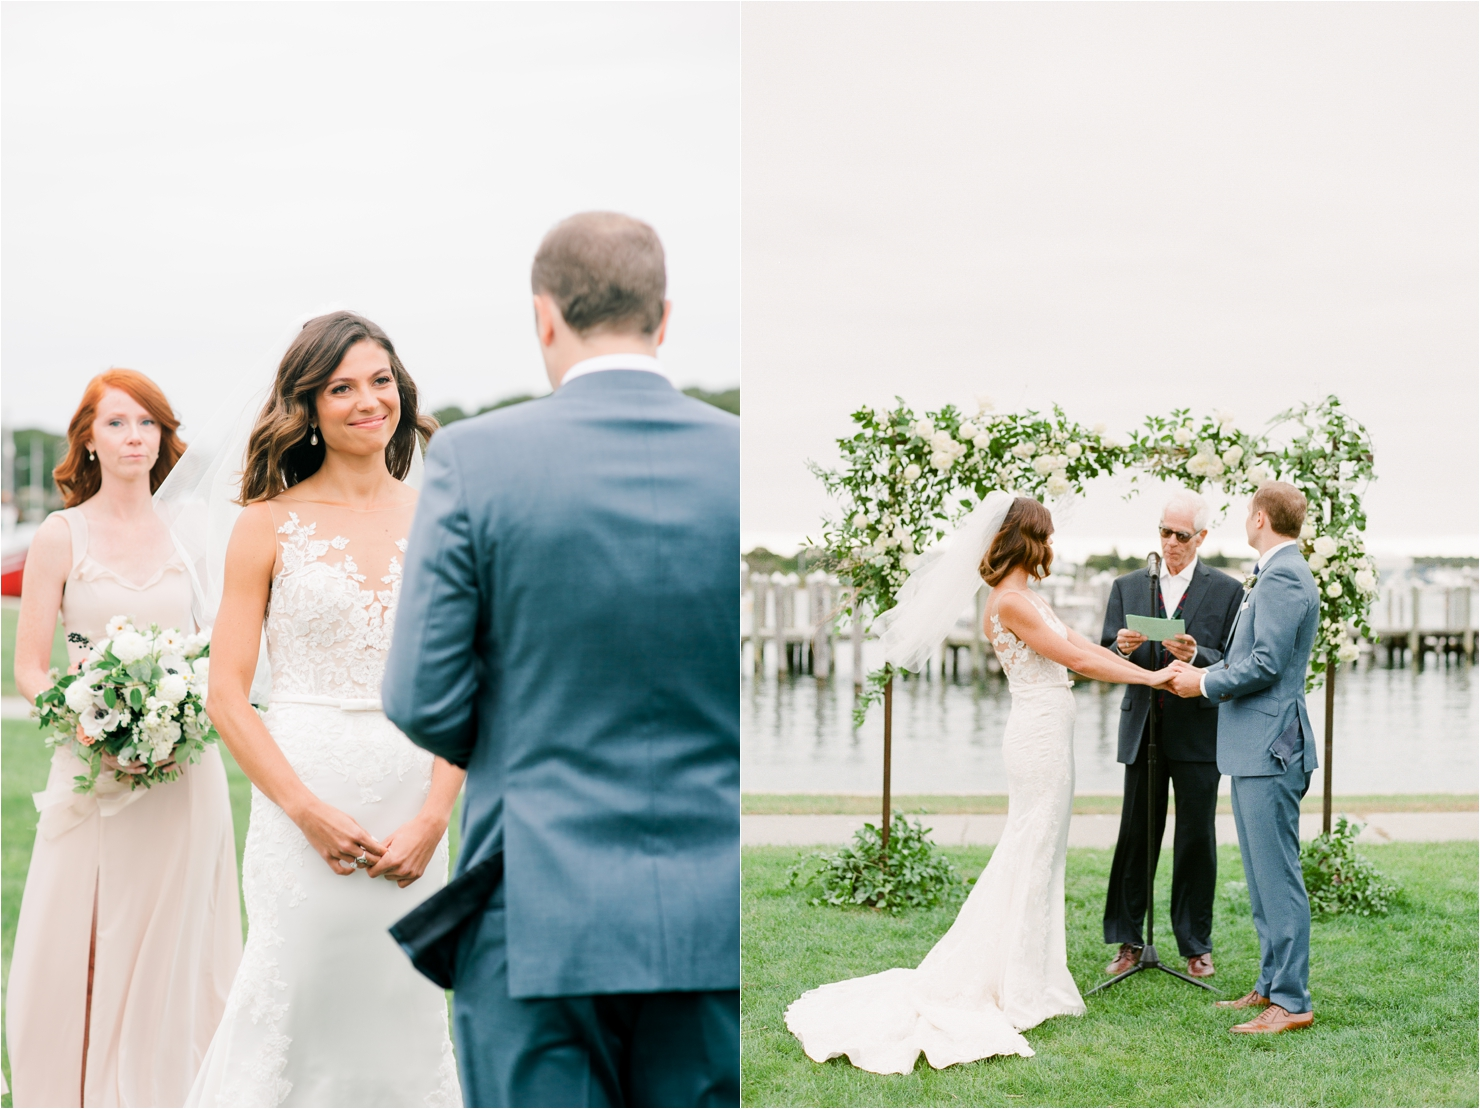 Bride and Groom getting married outside at Gurneys Montauk Start Island Resort